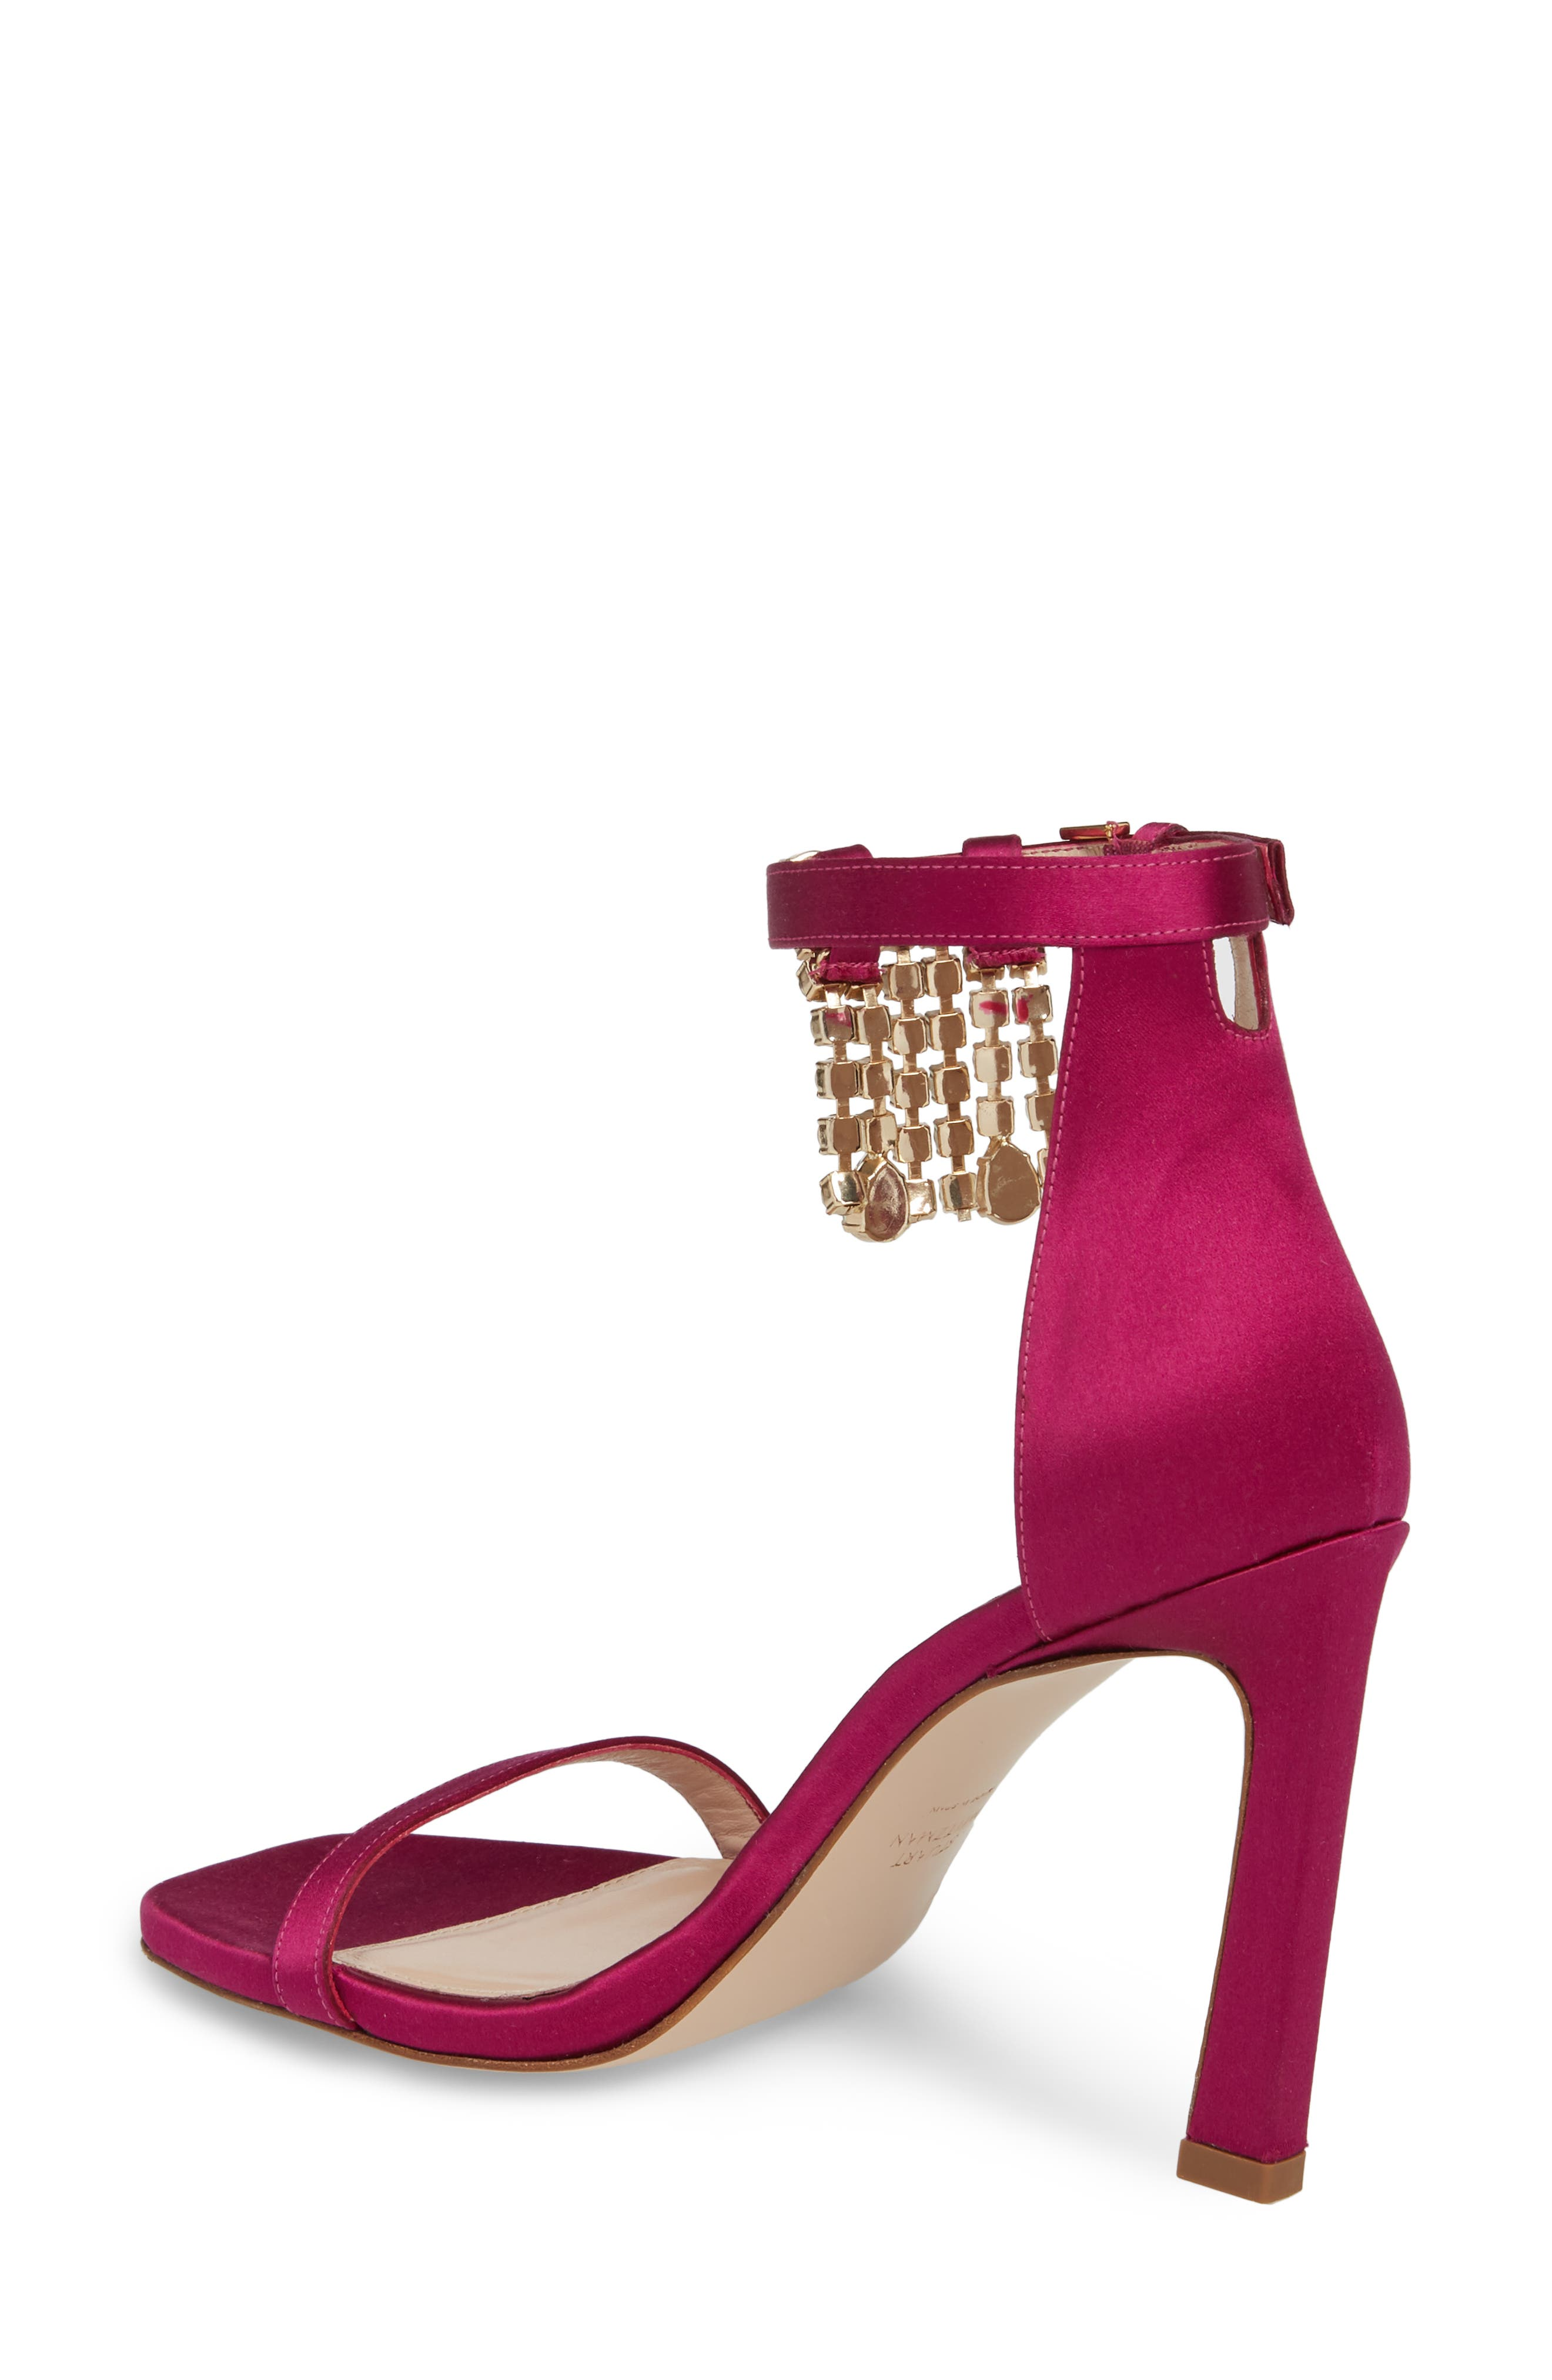 100FRINGESQUARENUDIST Sandal,                             Alternate thumbnail 2, color,                             Grape Silk Satin